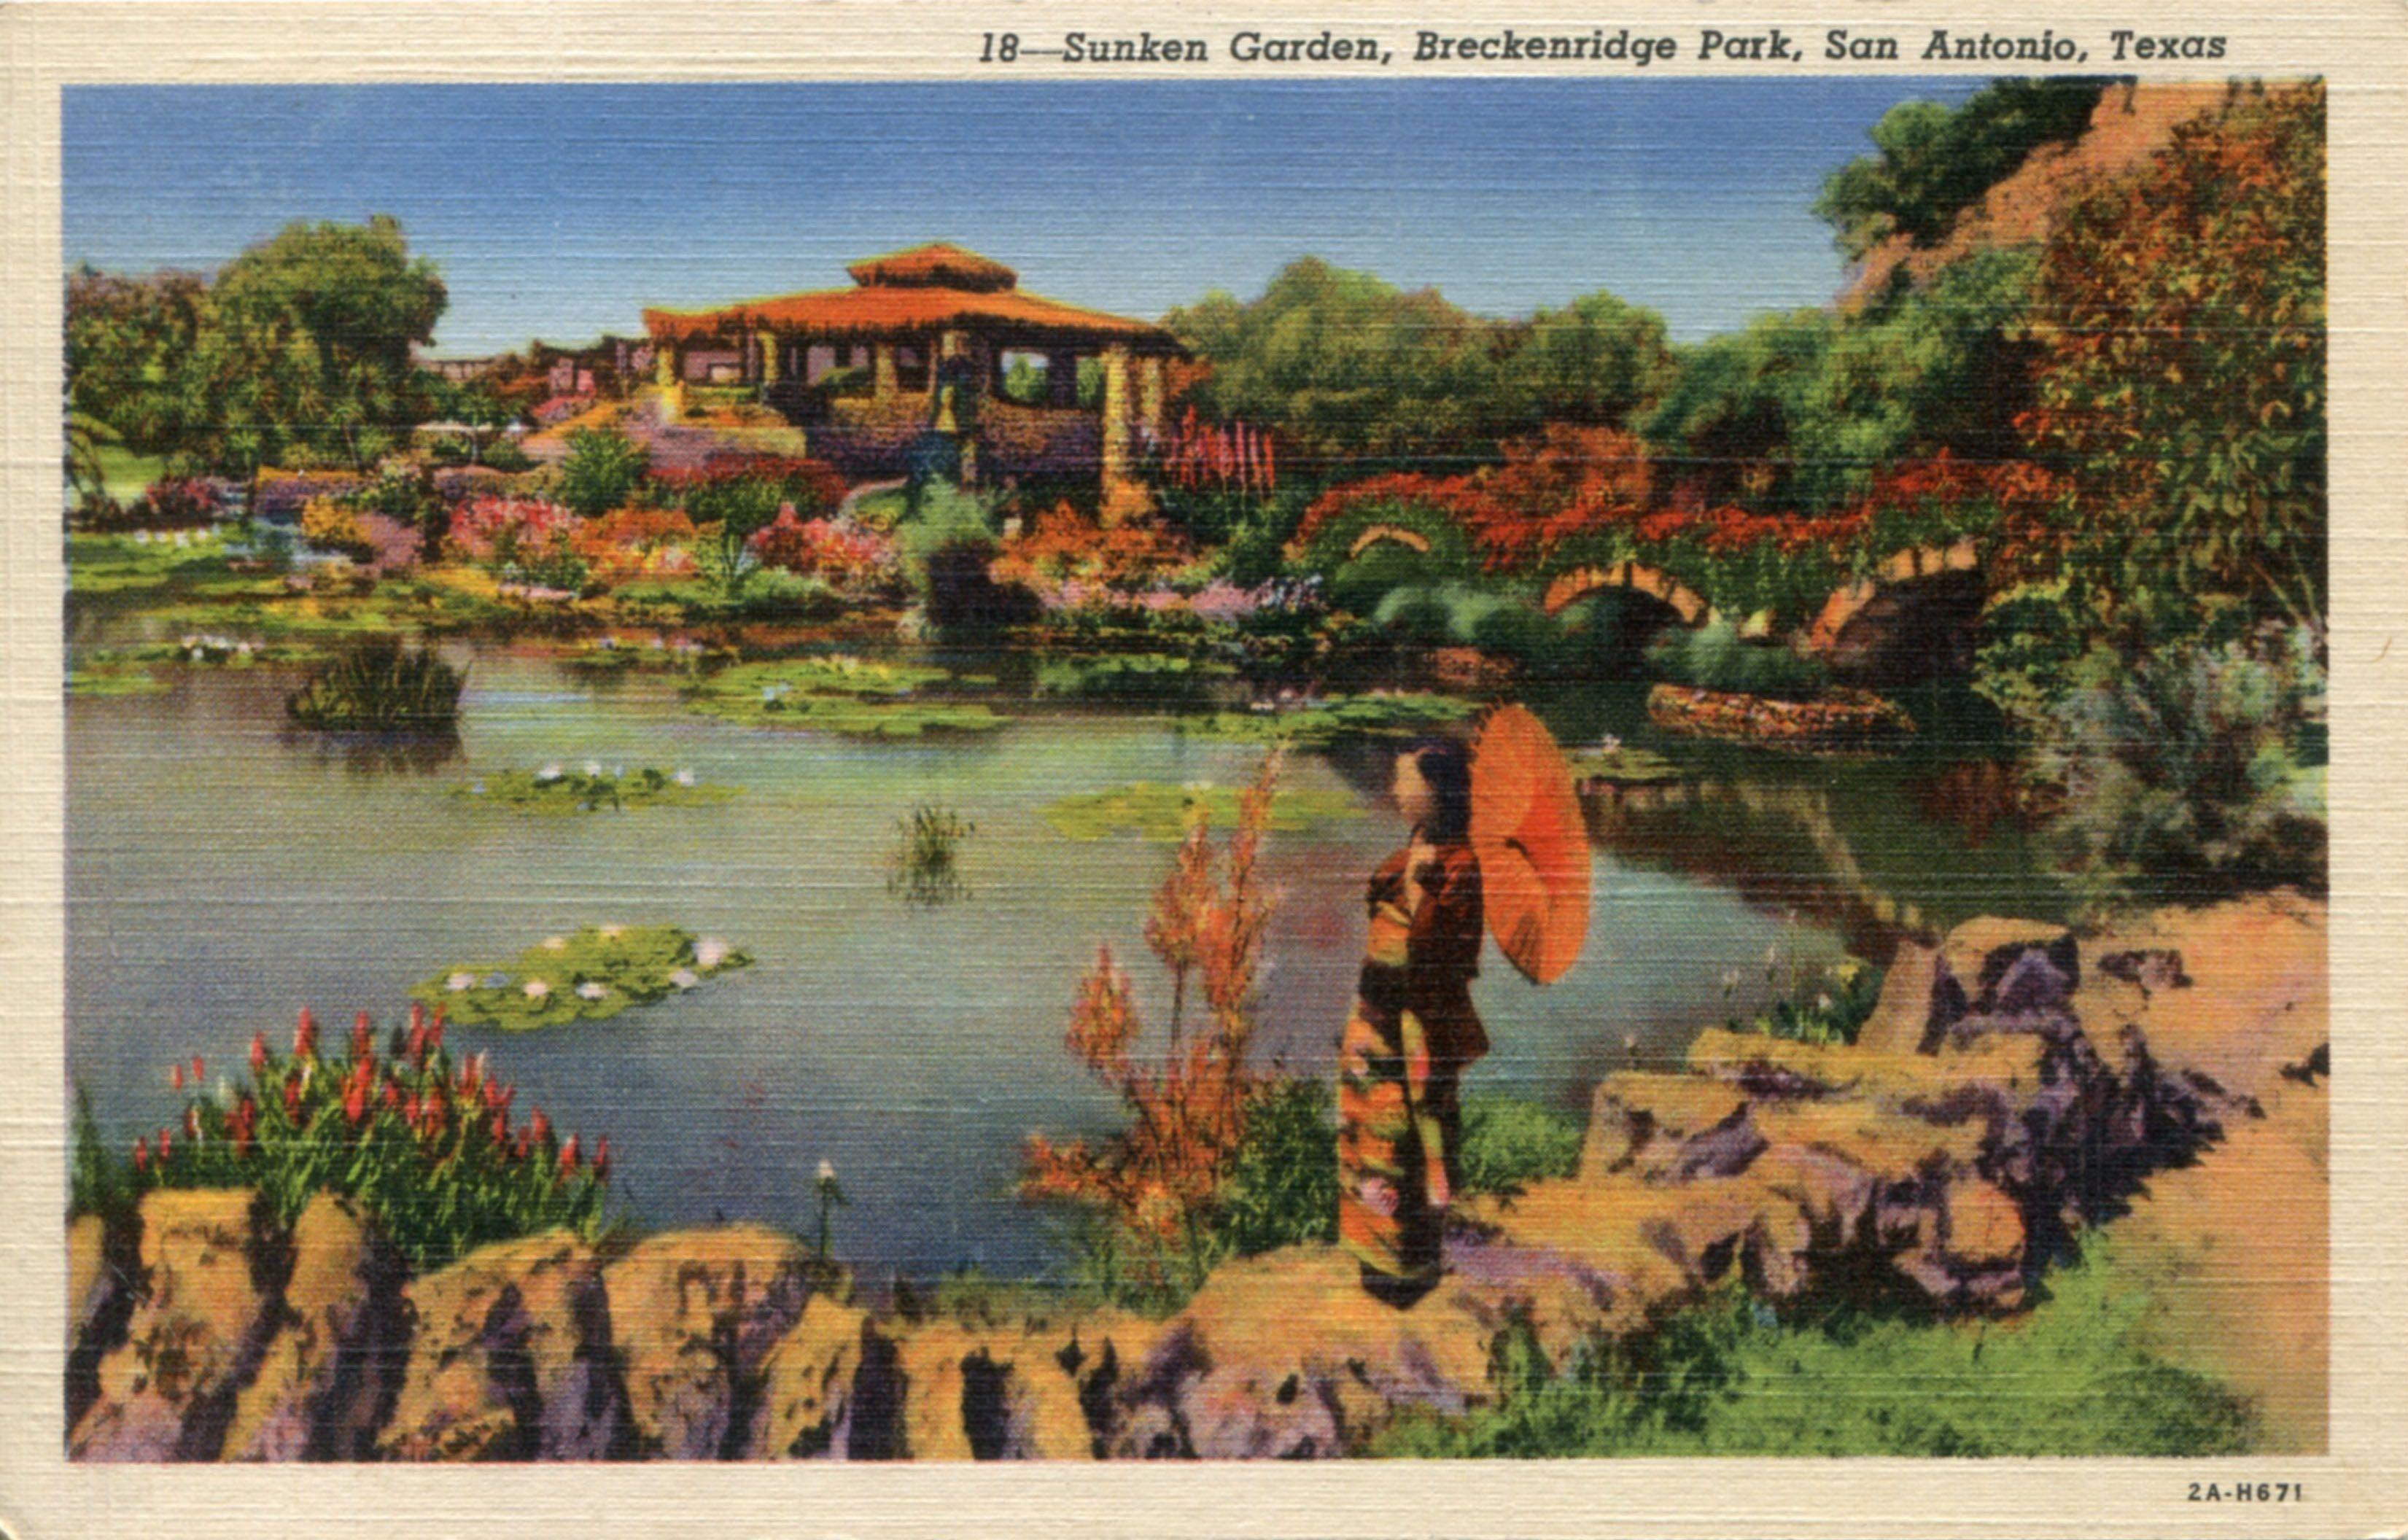 SUNKEN GARDEN, BRECKENRIDGE PARK, SAN ANTONIO, TEXAS One of the ...